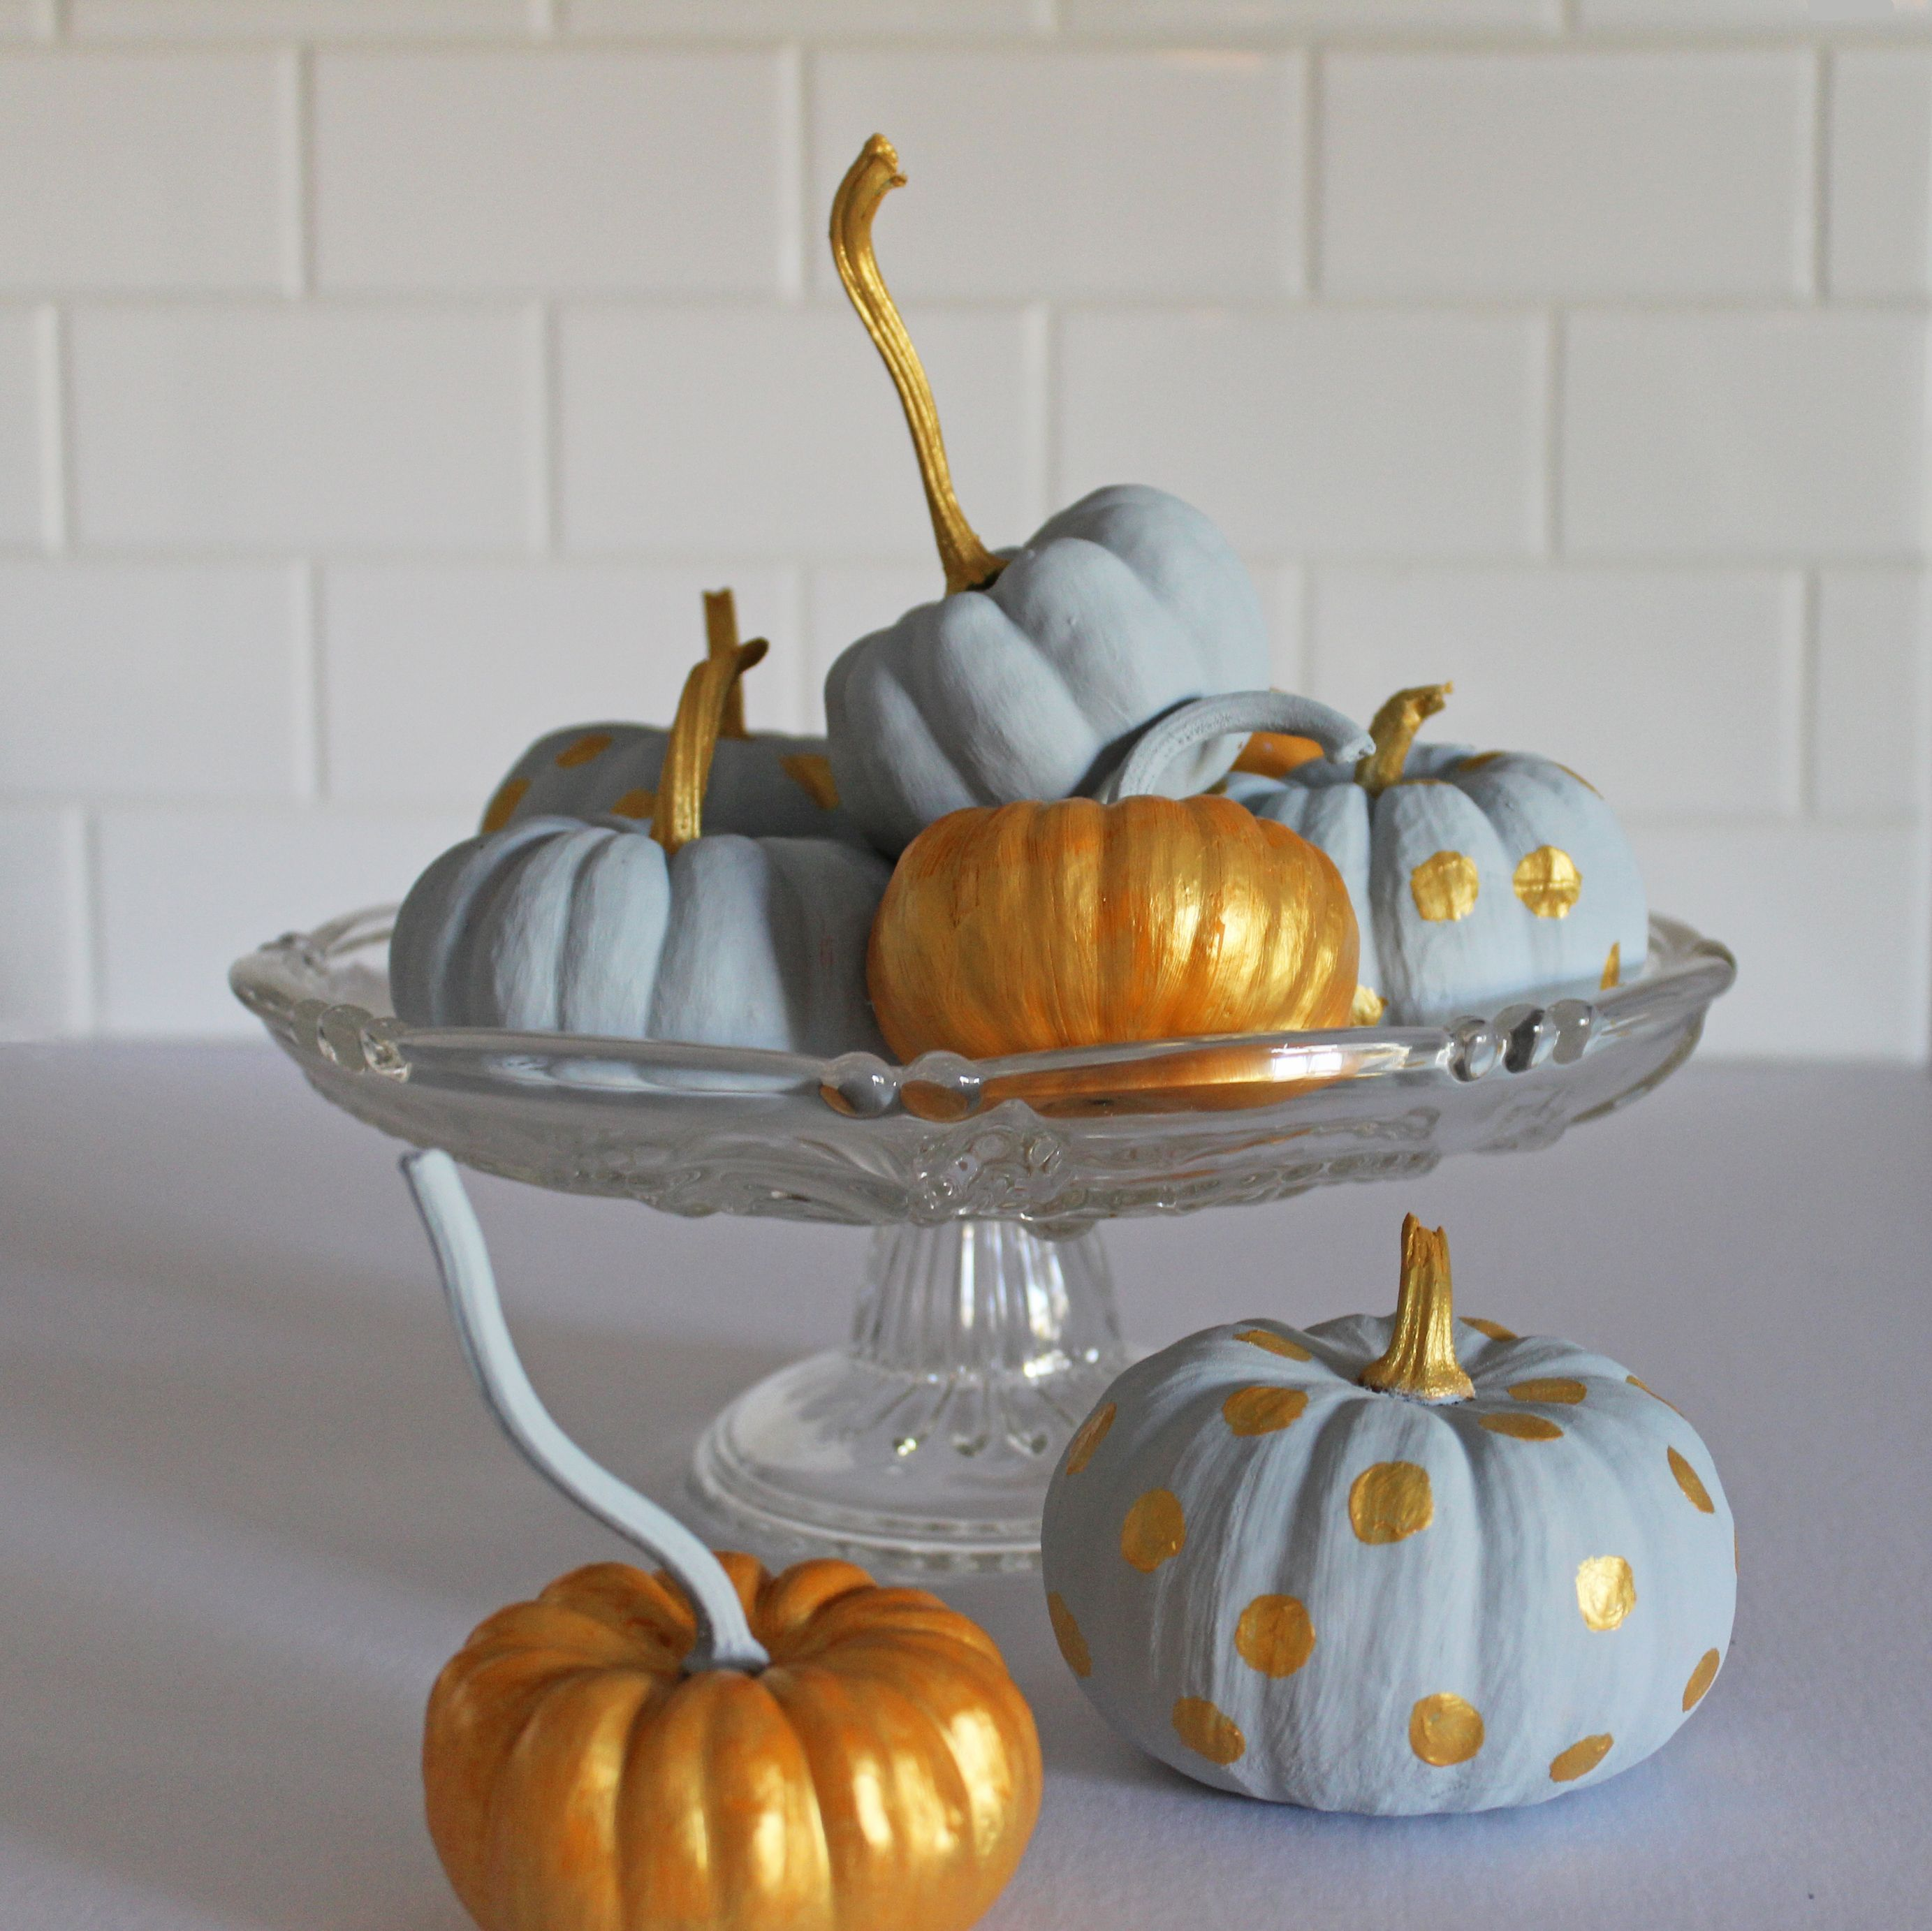 16 easy pumpkin decorating ideas painted pumpkins how to - Pumpkin Decorating Ideas